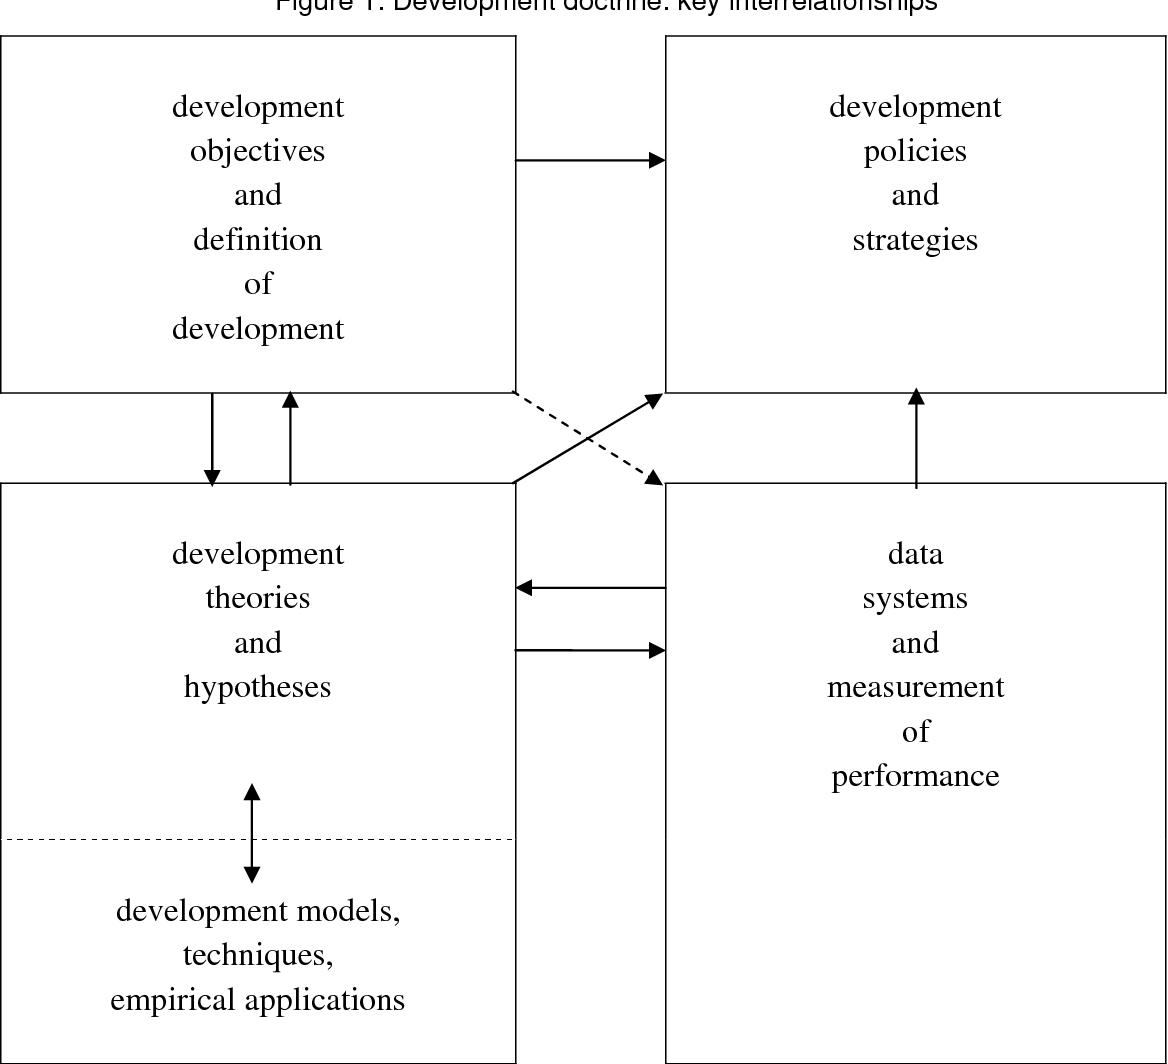 PDF] The Evolution of the Development Doctrine, 1950-2005